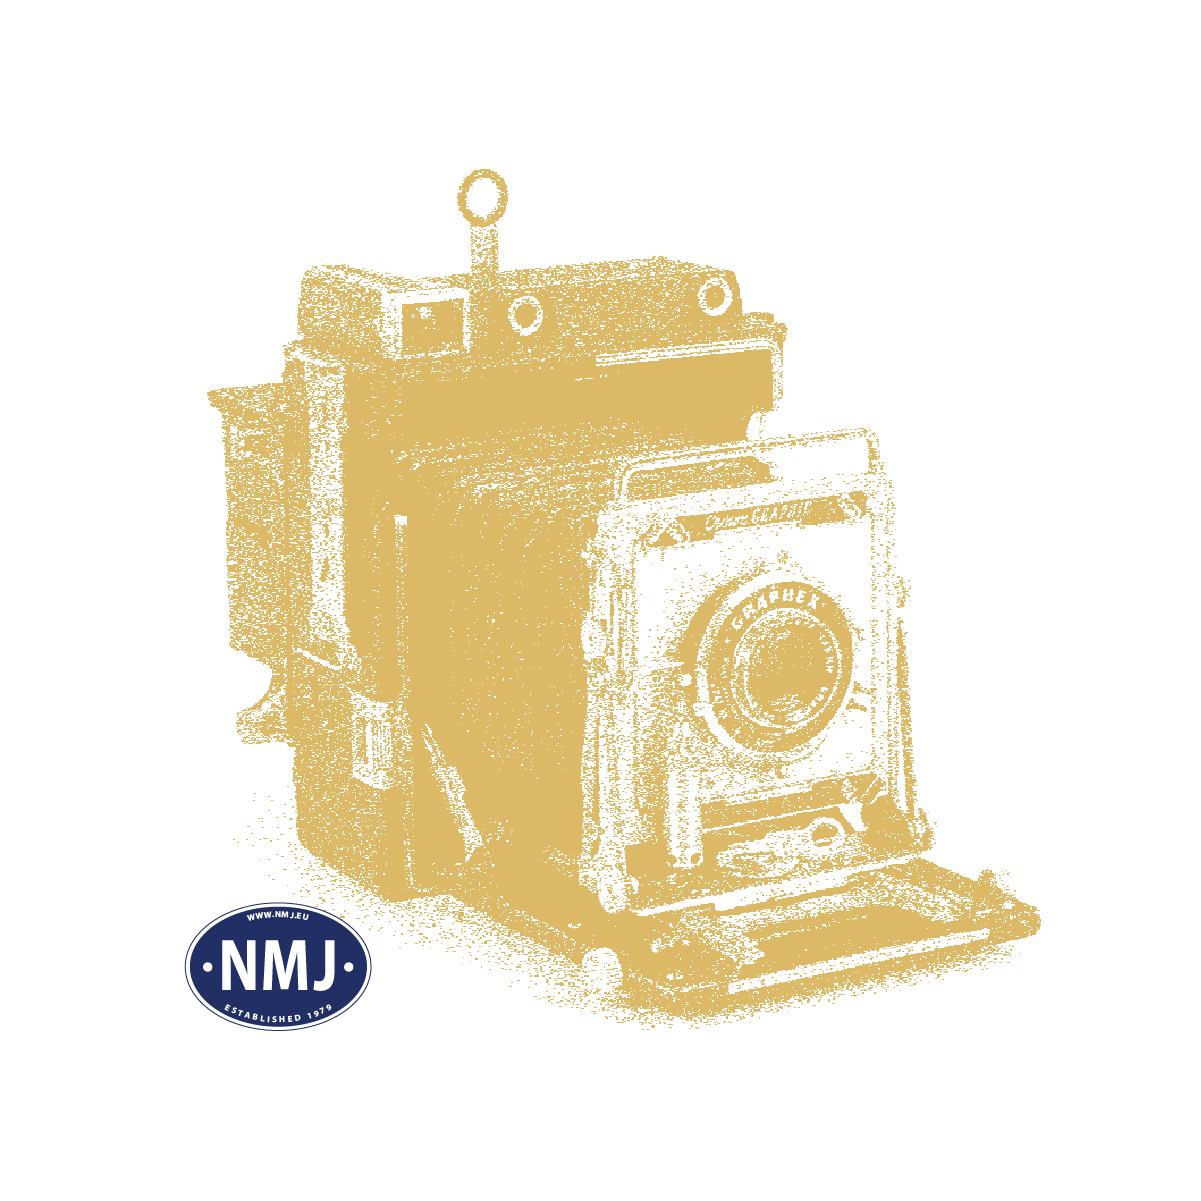 NOC15843 - Nudister